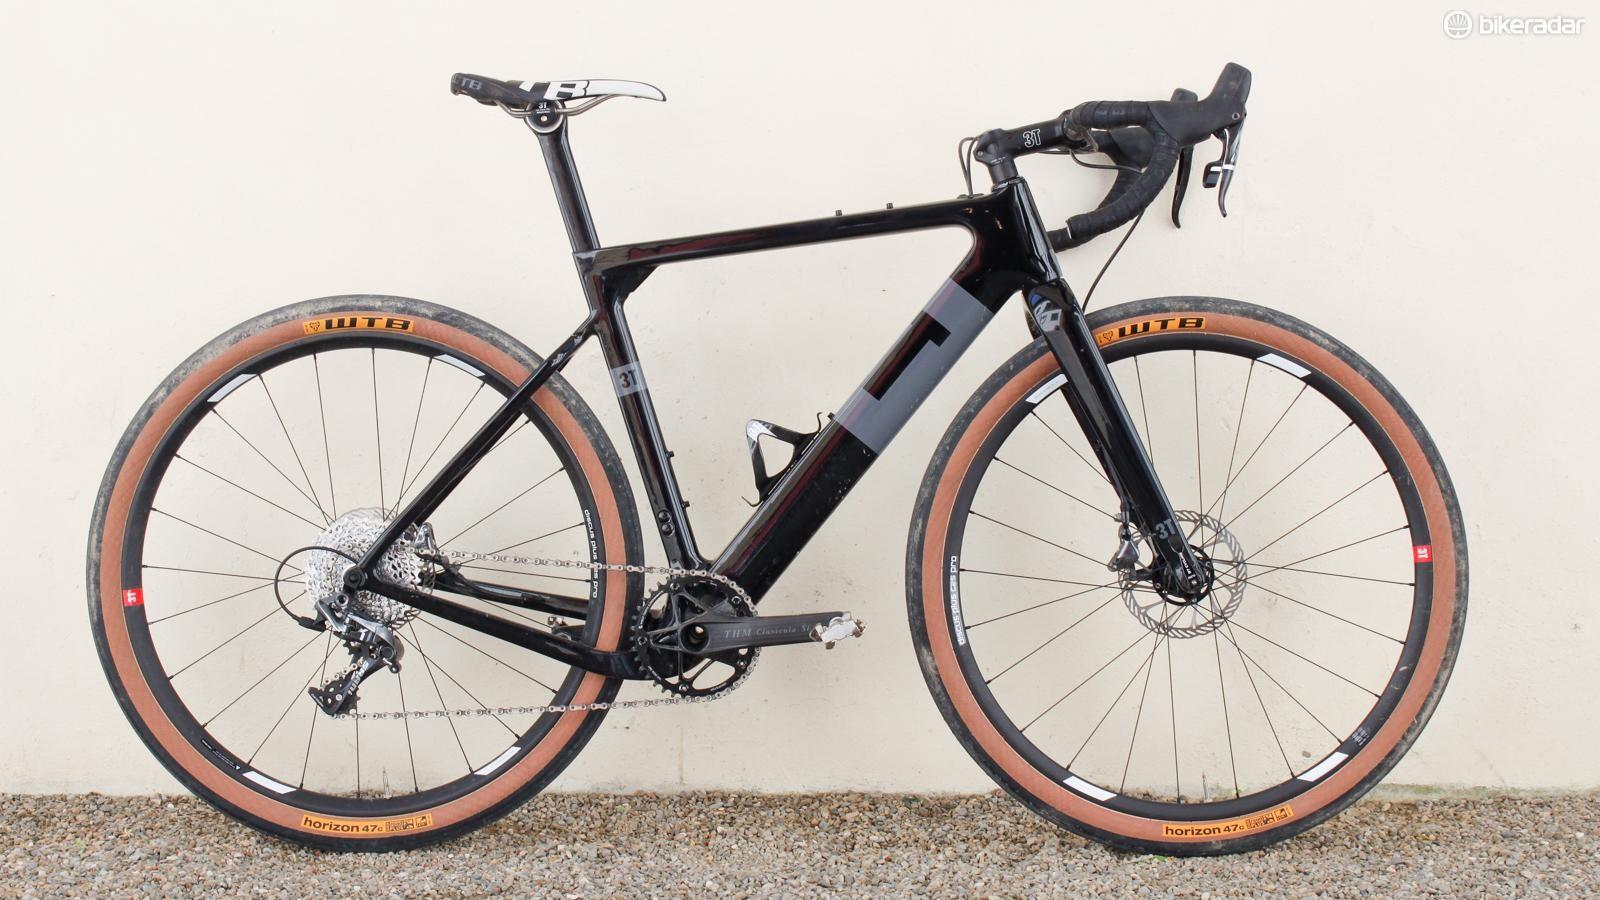 The Exploro test bike